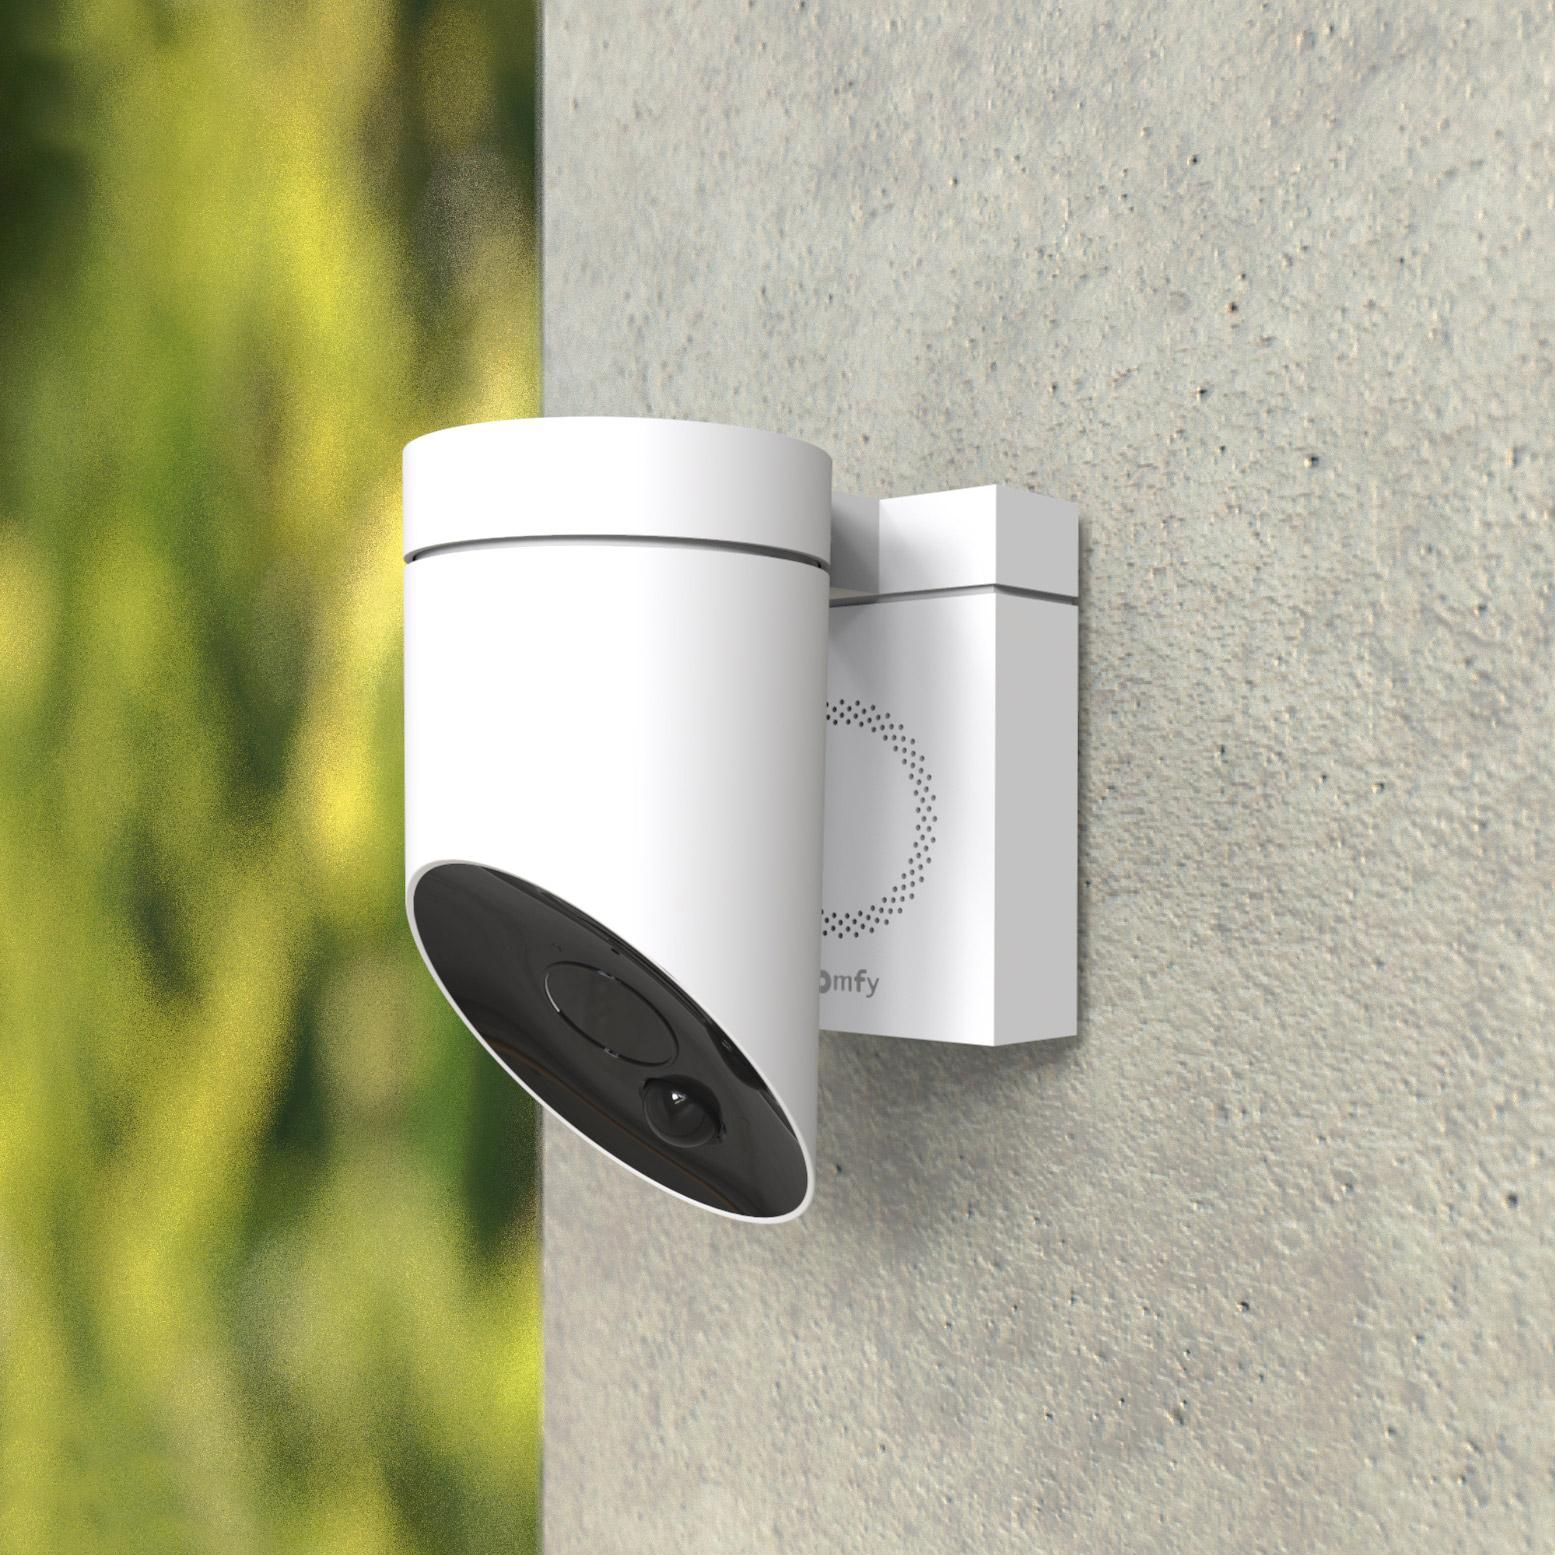 Camera De Surveillance Somfy Connectee Filaire Blanc Protect En 2020 Camera Surveillance Raccordement Electrique Produits